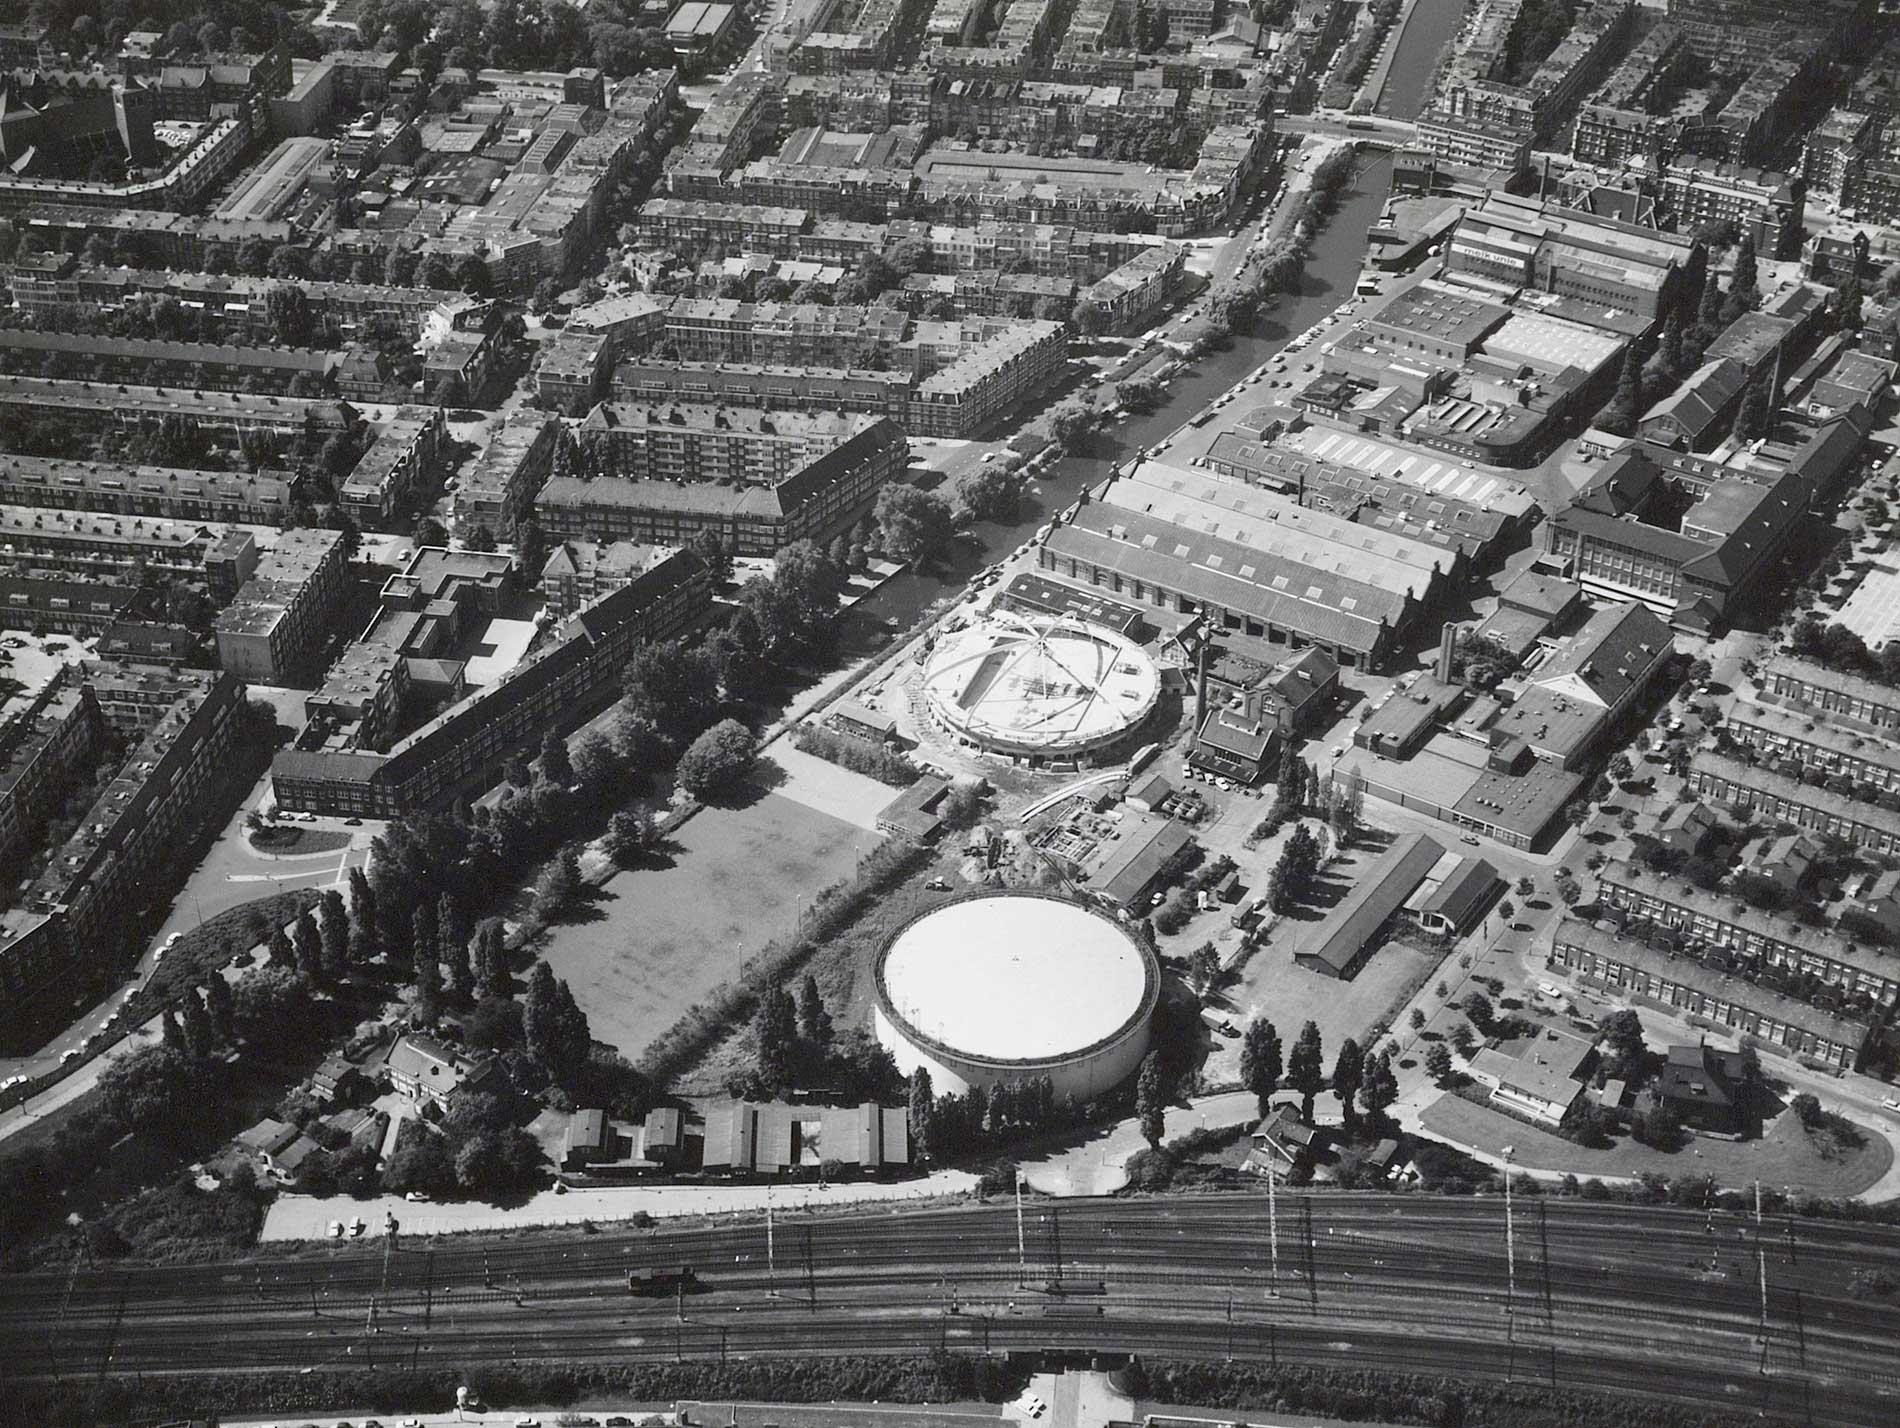 Luchtfoto met Oranjevrijstraat i.v.m. bouw sporthal